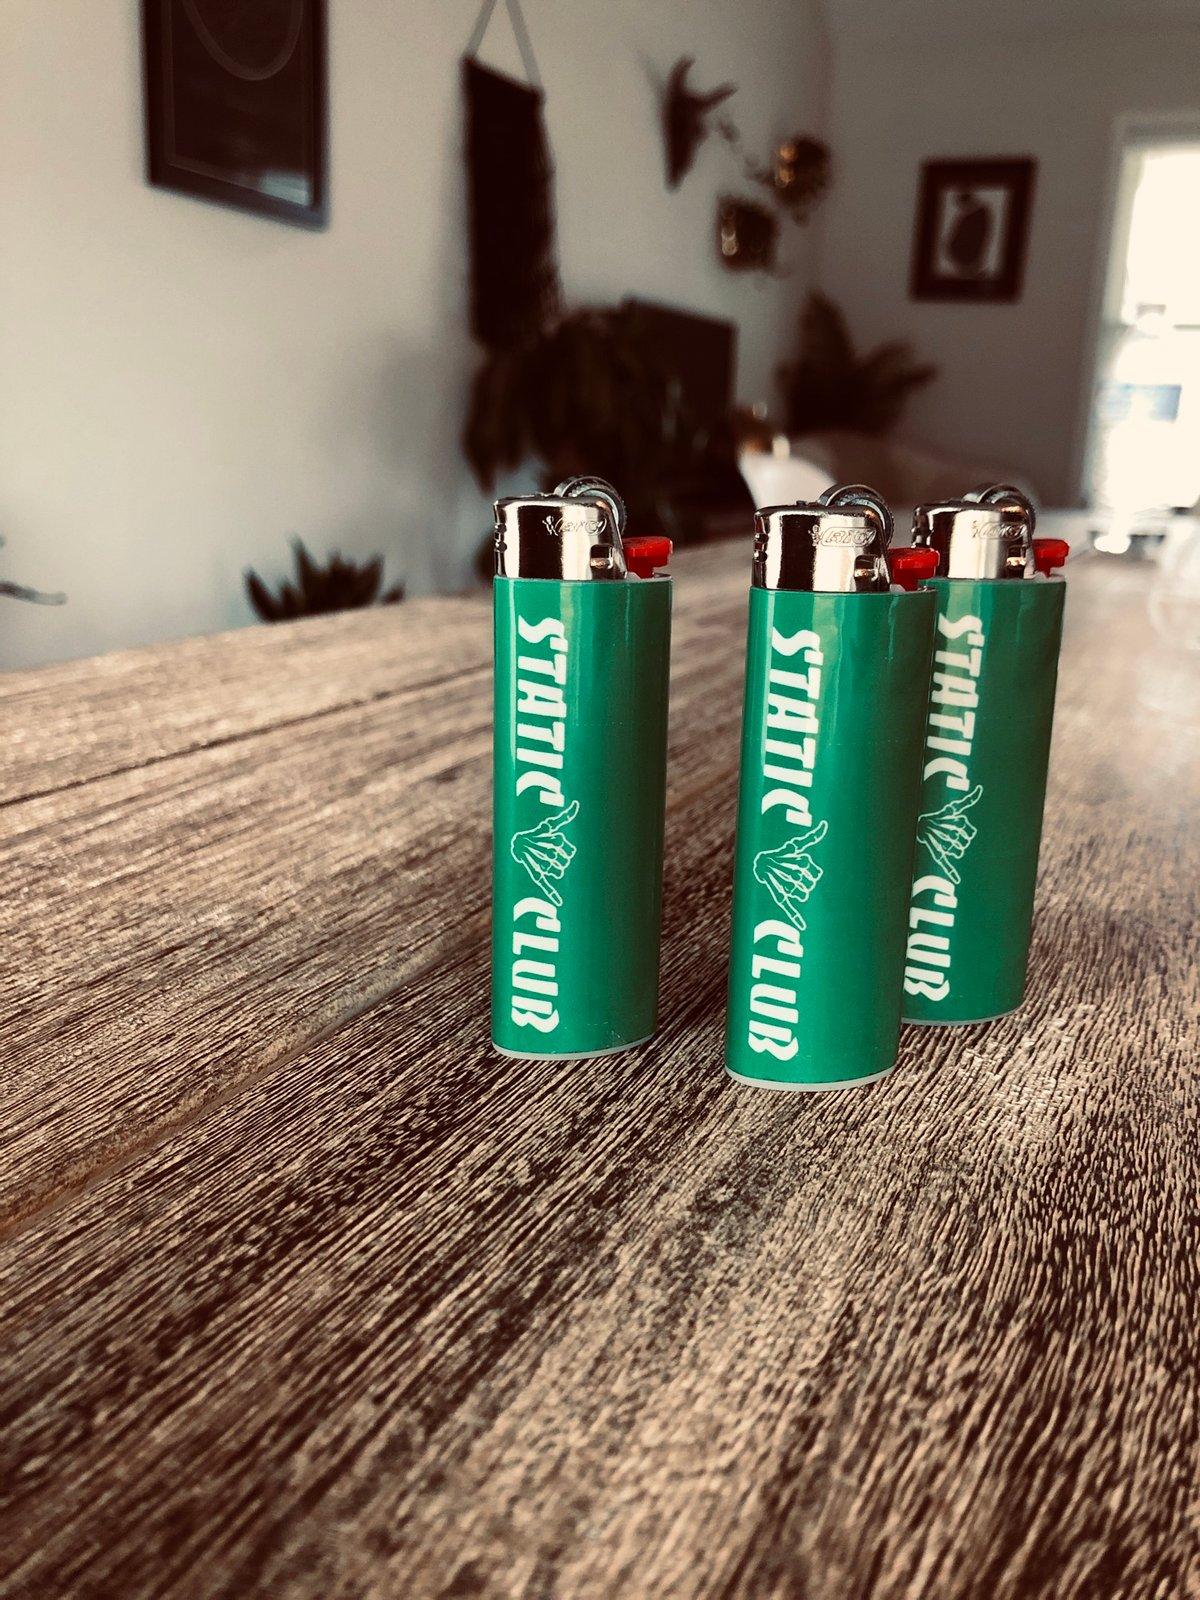 420 Lighters